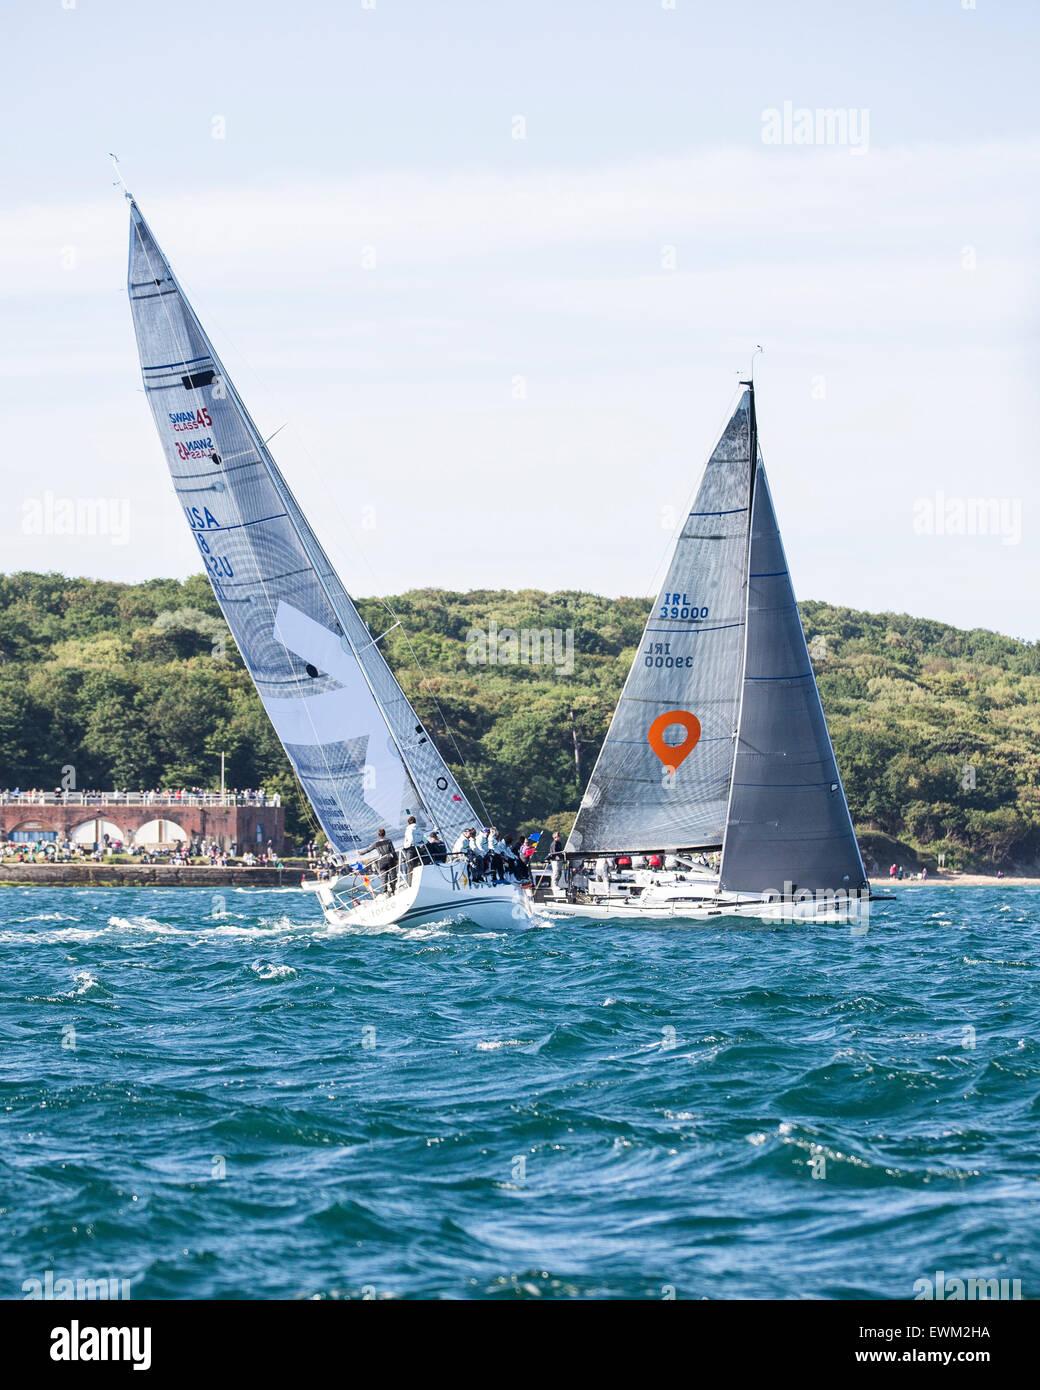 UK. 27th June, 2015. Swan 45 USA 18 'K Force' (nearer) and Mills 59 IRL 3900 'Zero II' off Yarmouth - Stock Image